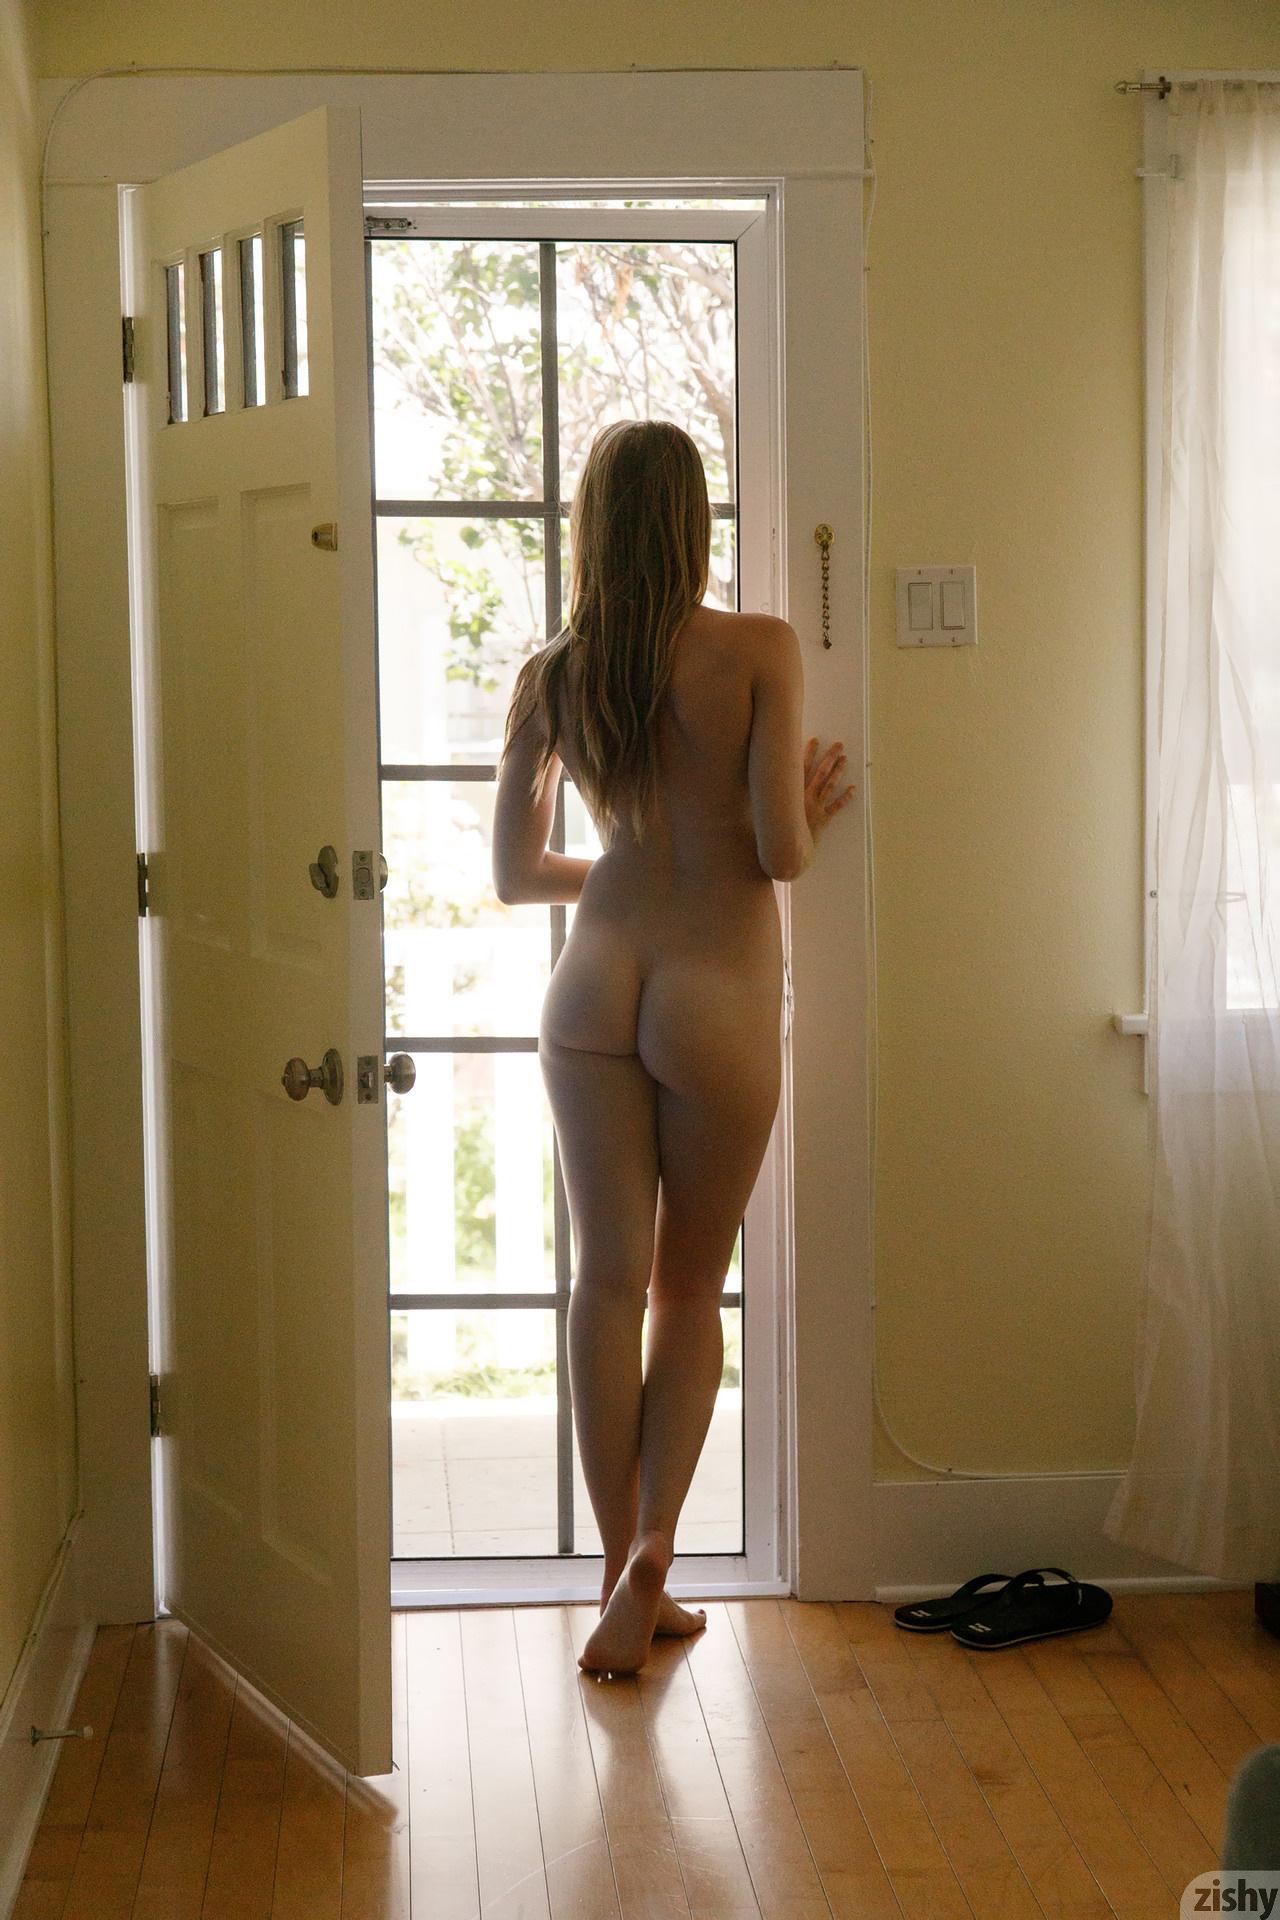 Ashley Lane Everyday People Zishy (53)